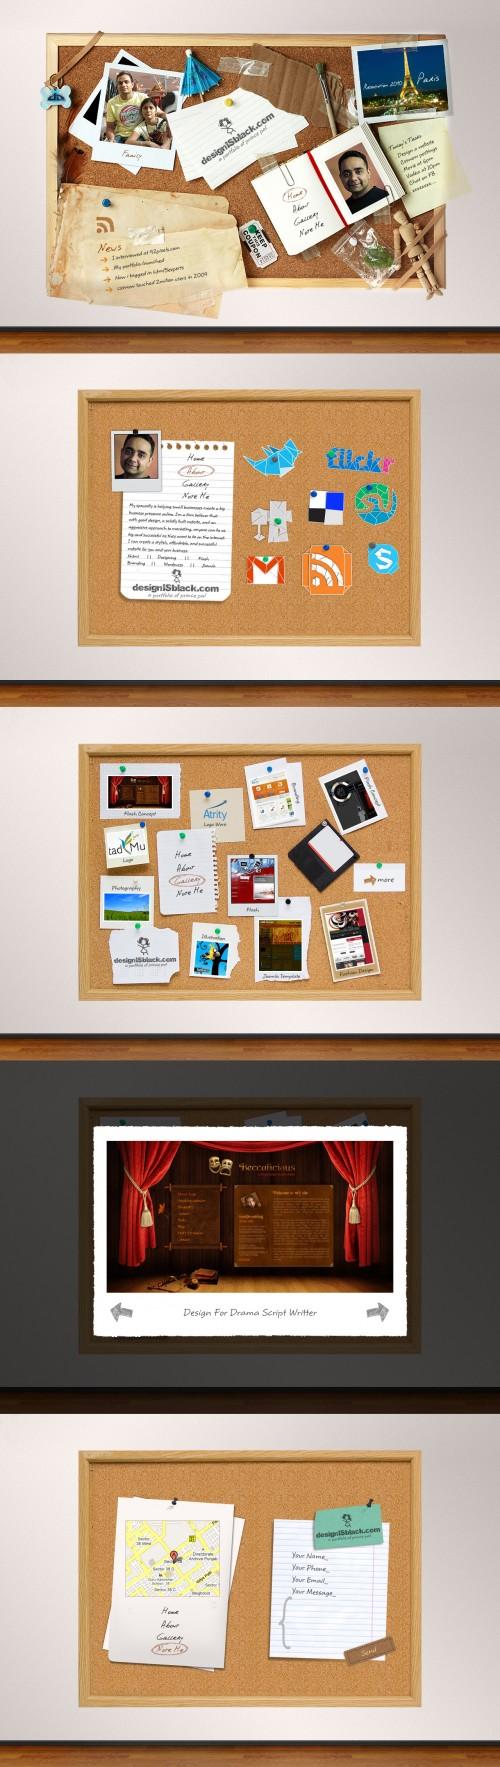 Creative Wall Inner